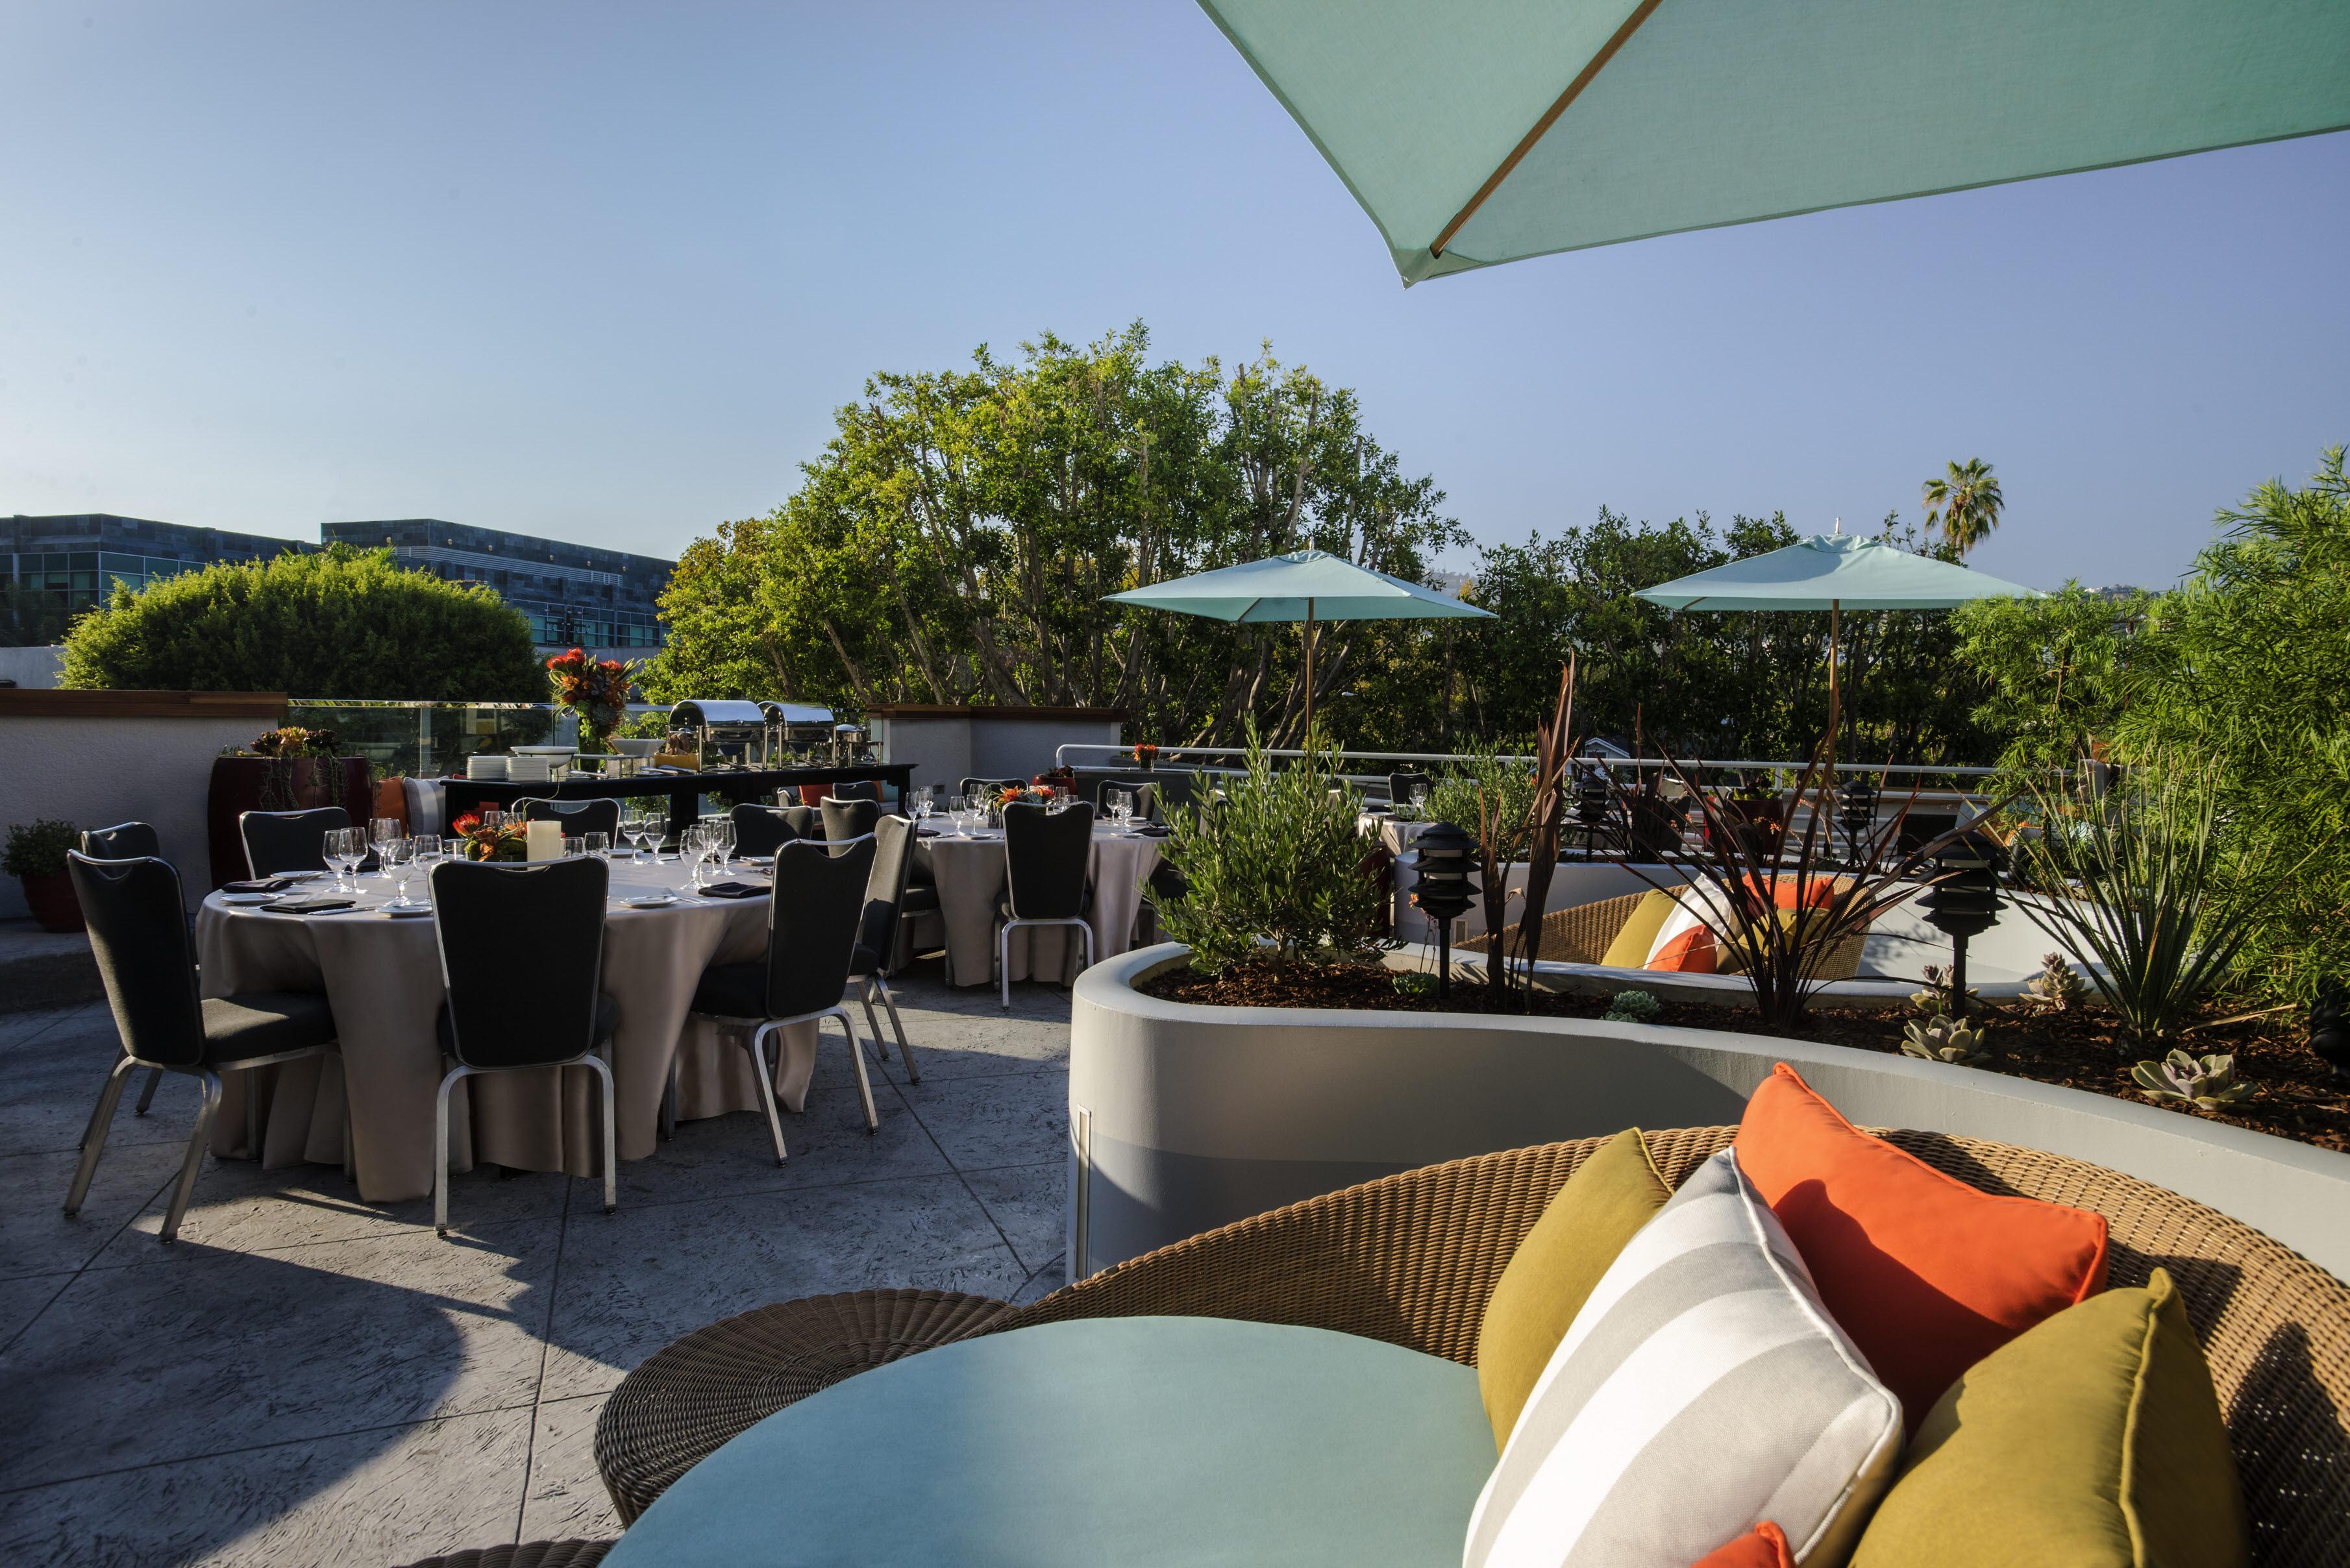 Sofitel Los Angeles at Beverly Hills image 2